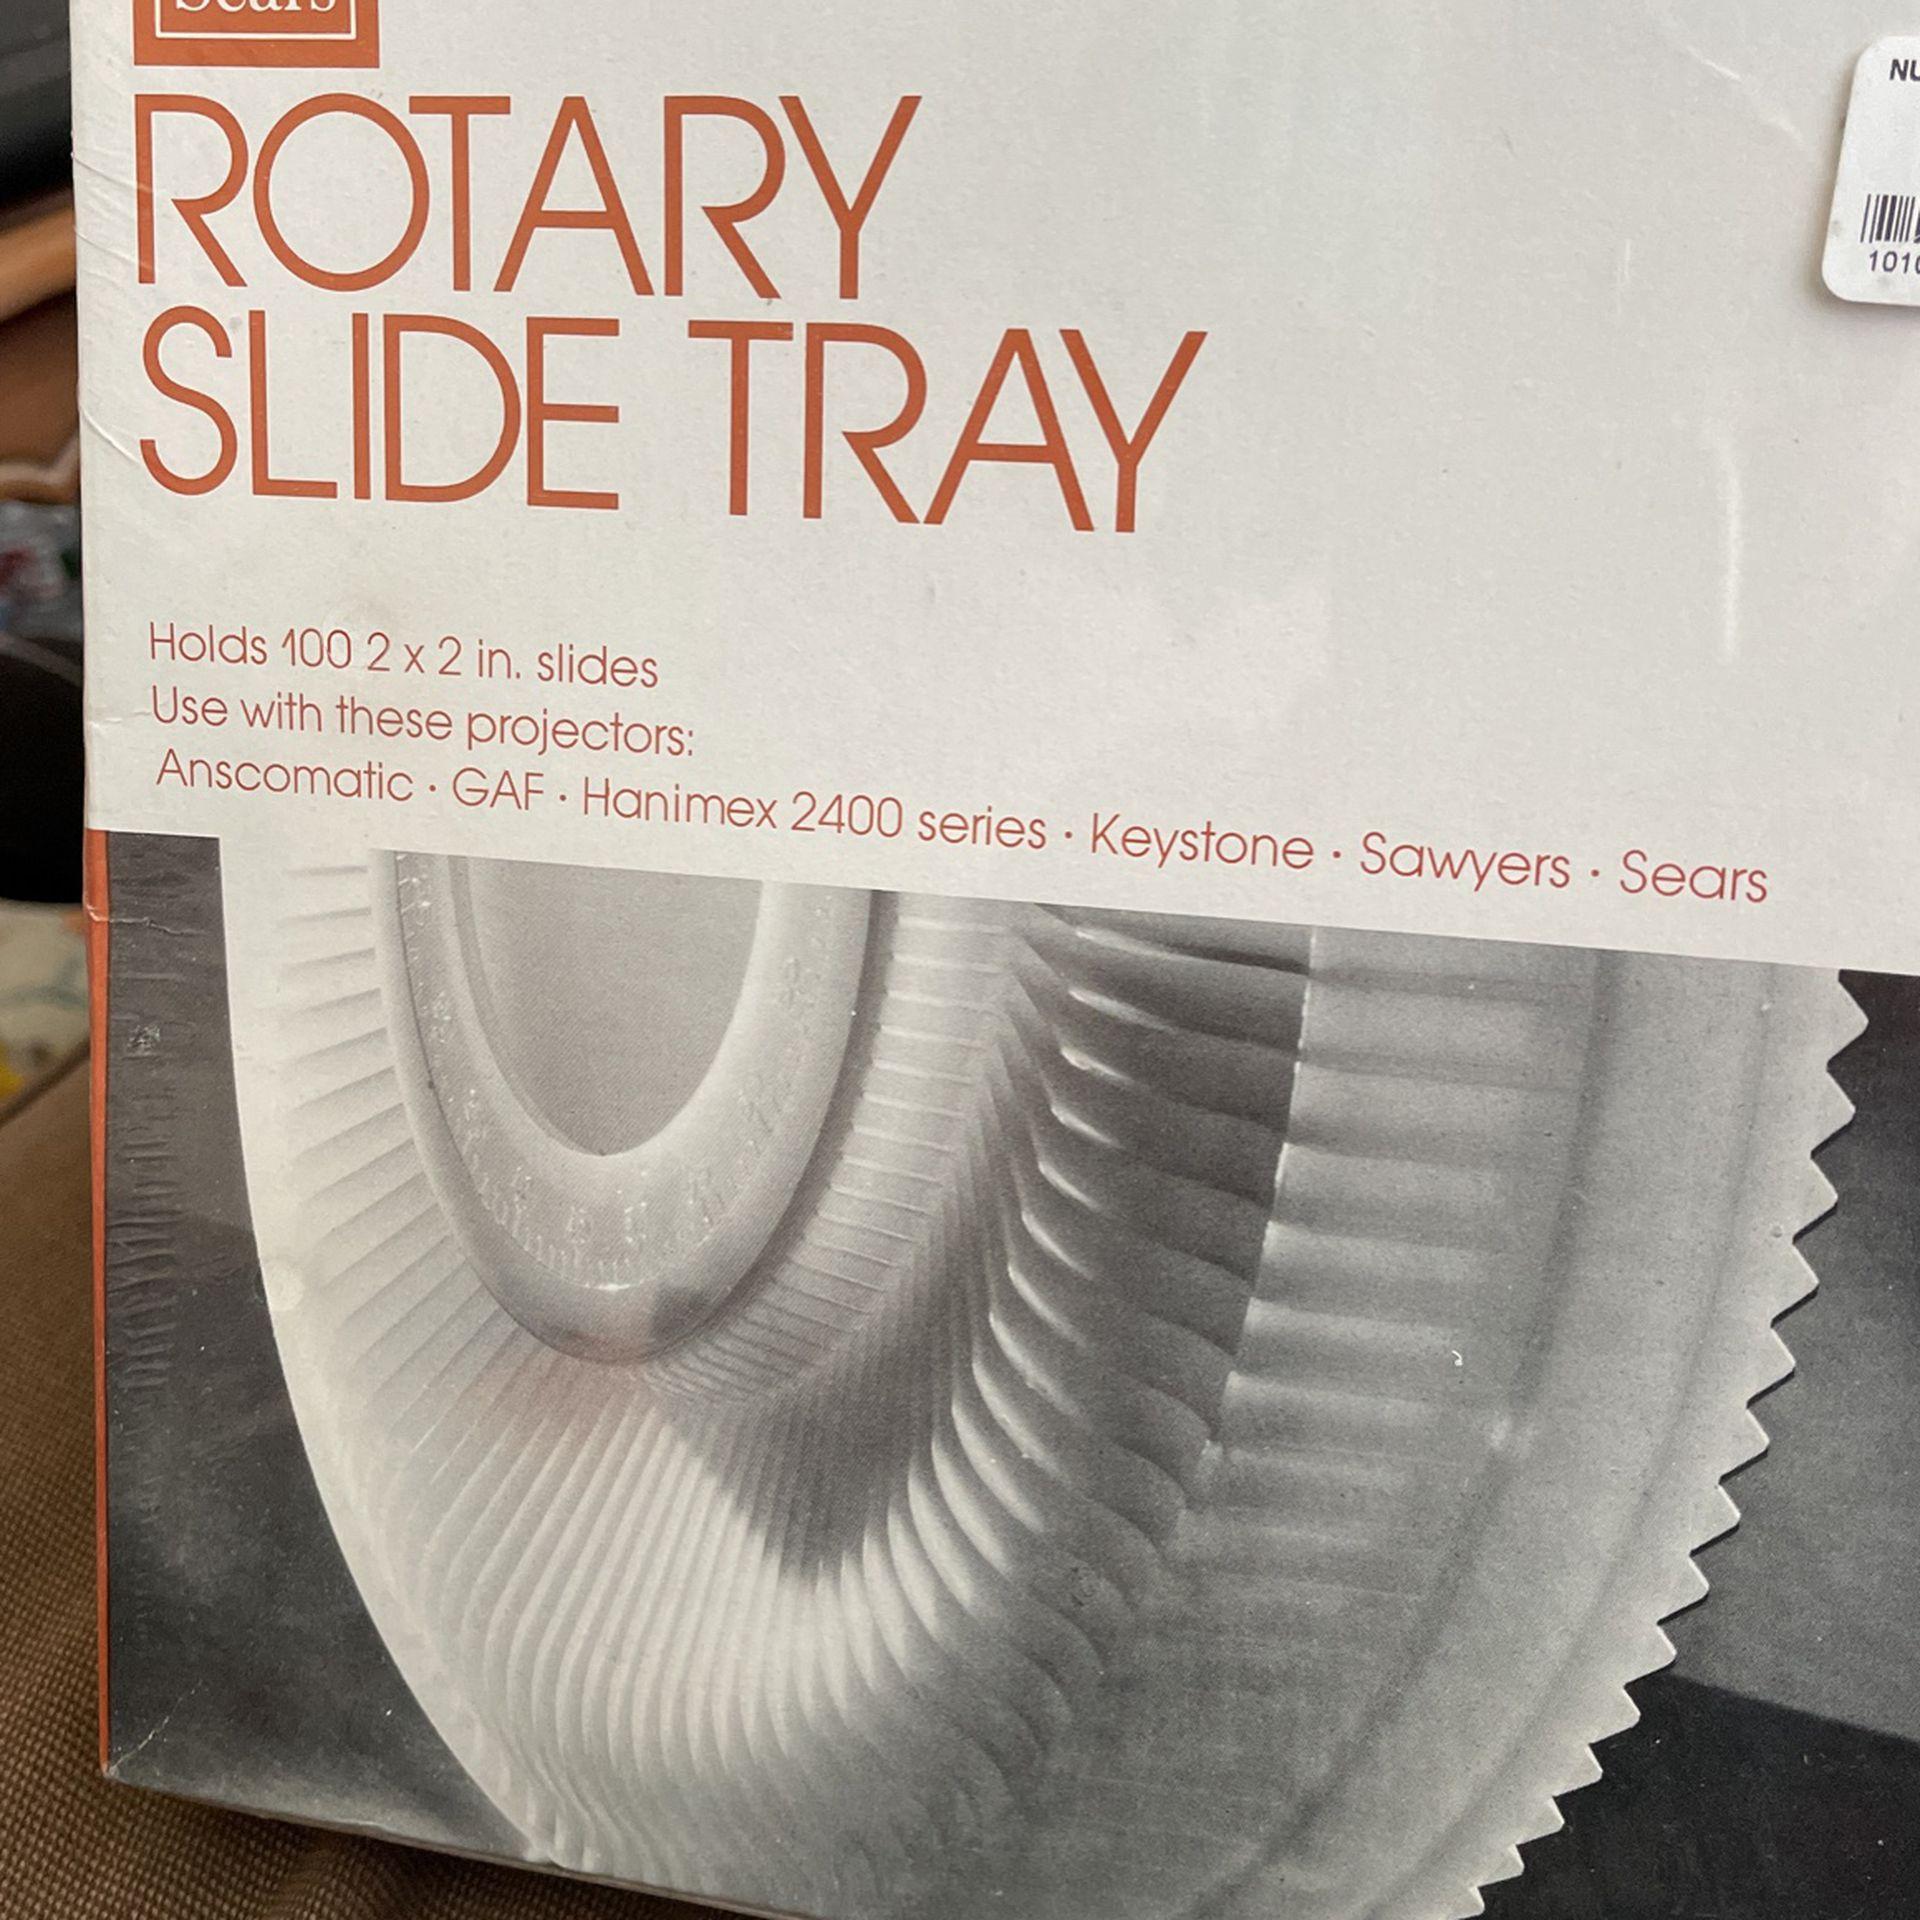 Vintage *NEW*ROTARY SLIDE TRAY-Holds 100 (2x2) Slides